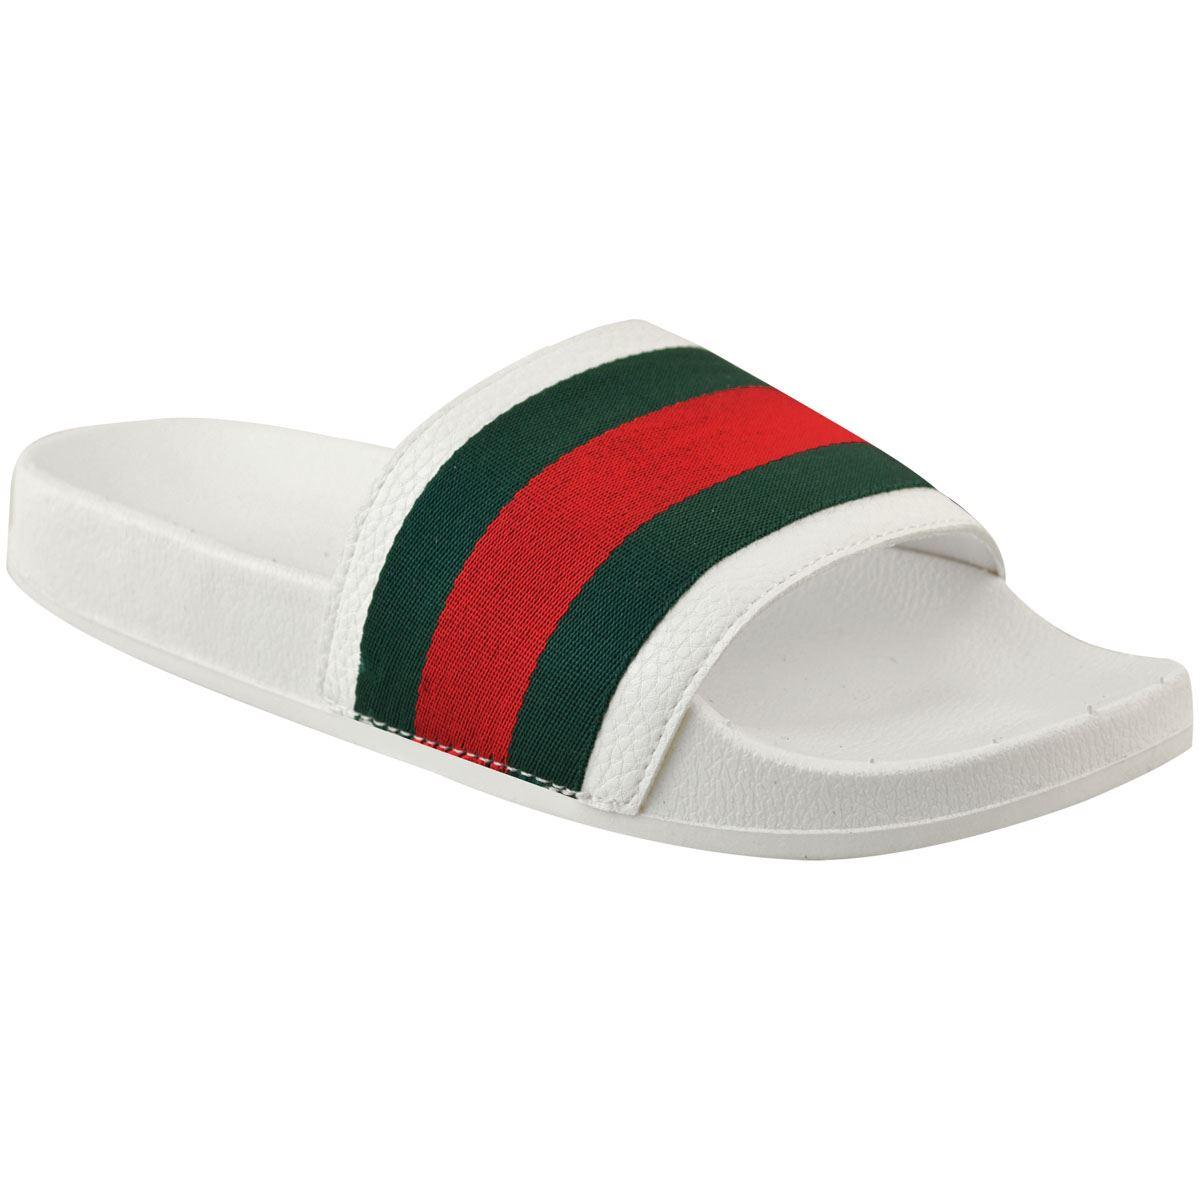 Womens-Striped-Sliders-Slides-Flat-Slip-On-Mules-Summer-Fashion-Sandals-Shoes-Sz thumbnail 9